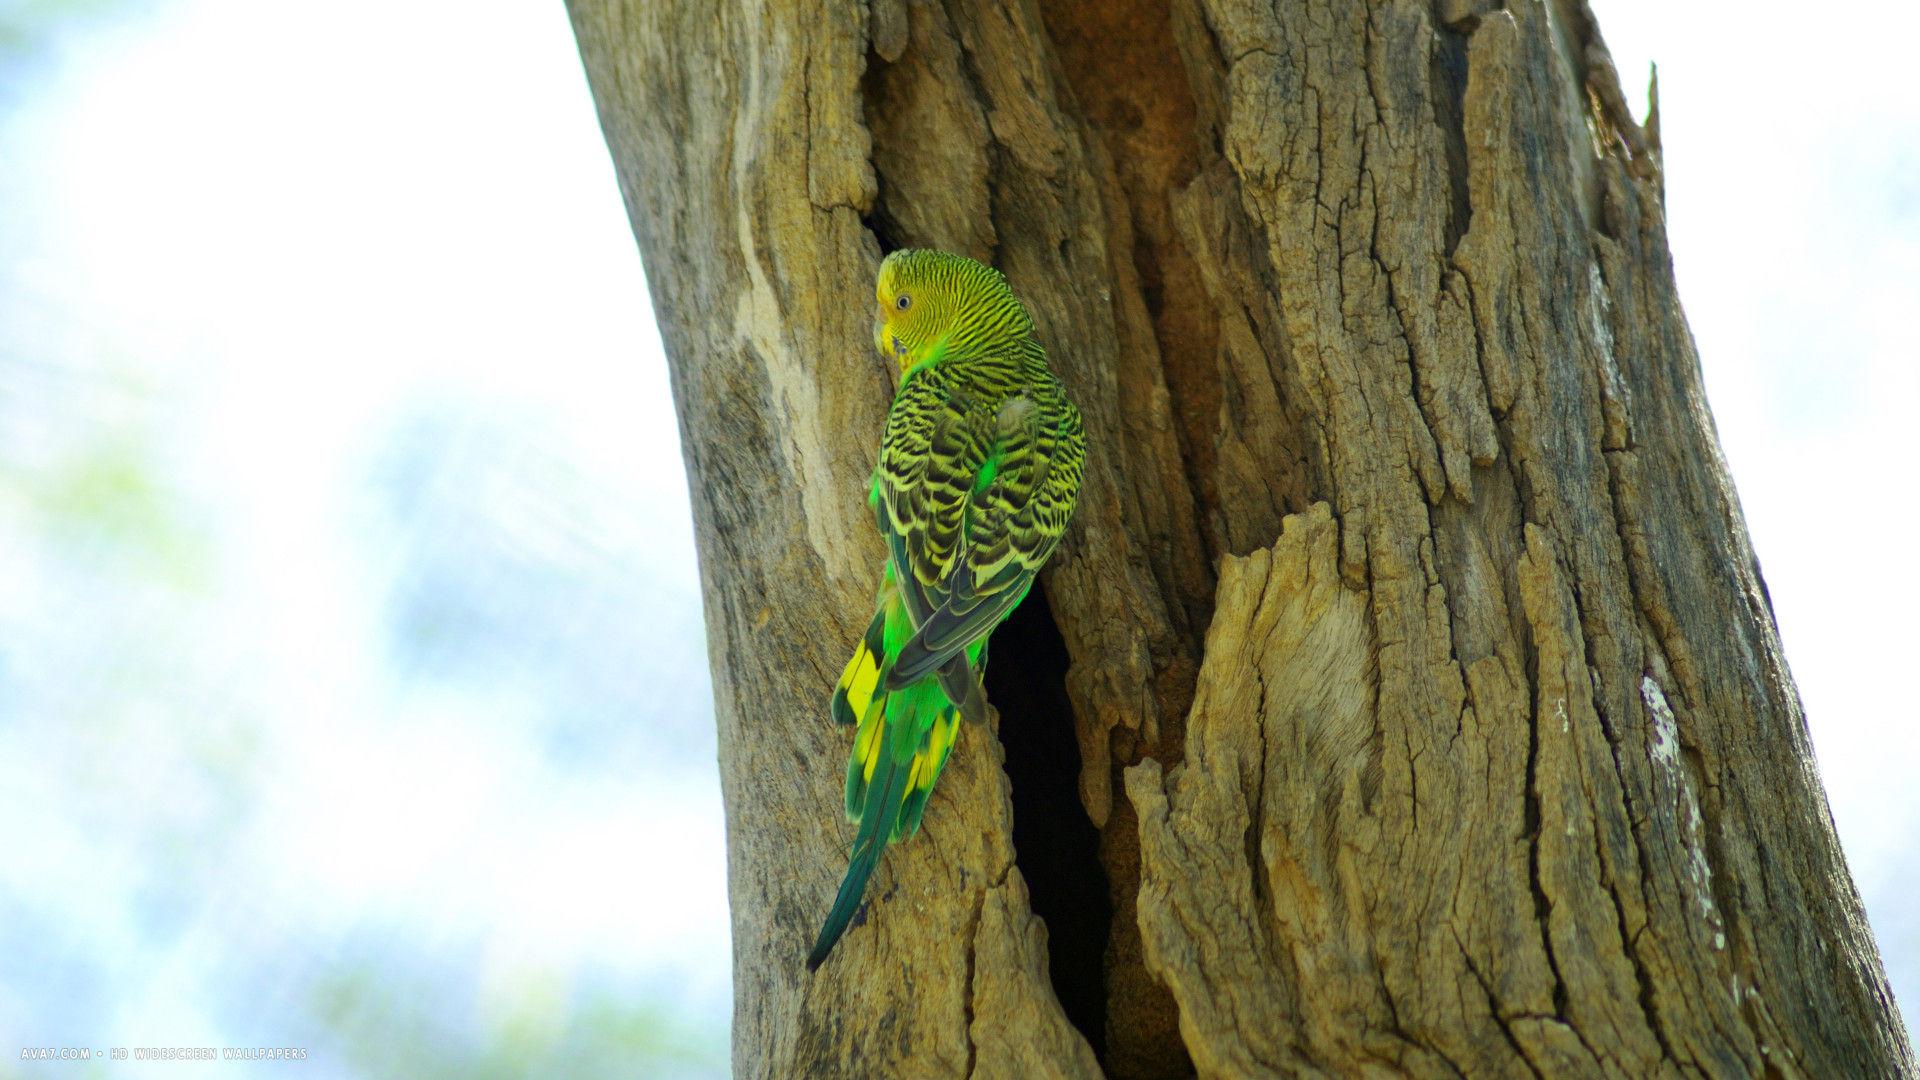 Cute Young Couple Hd Wallpaper Budgie Melopsittacus Undulatus Tree Nest Wild Bird Hd